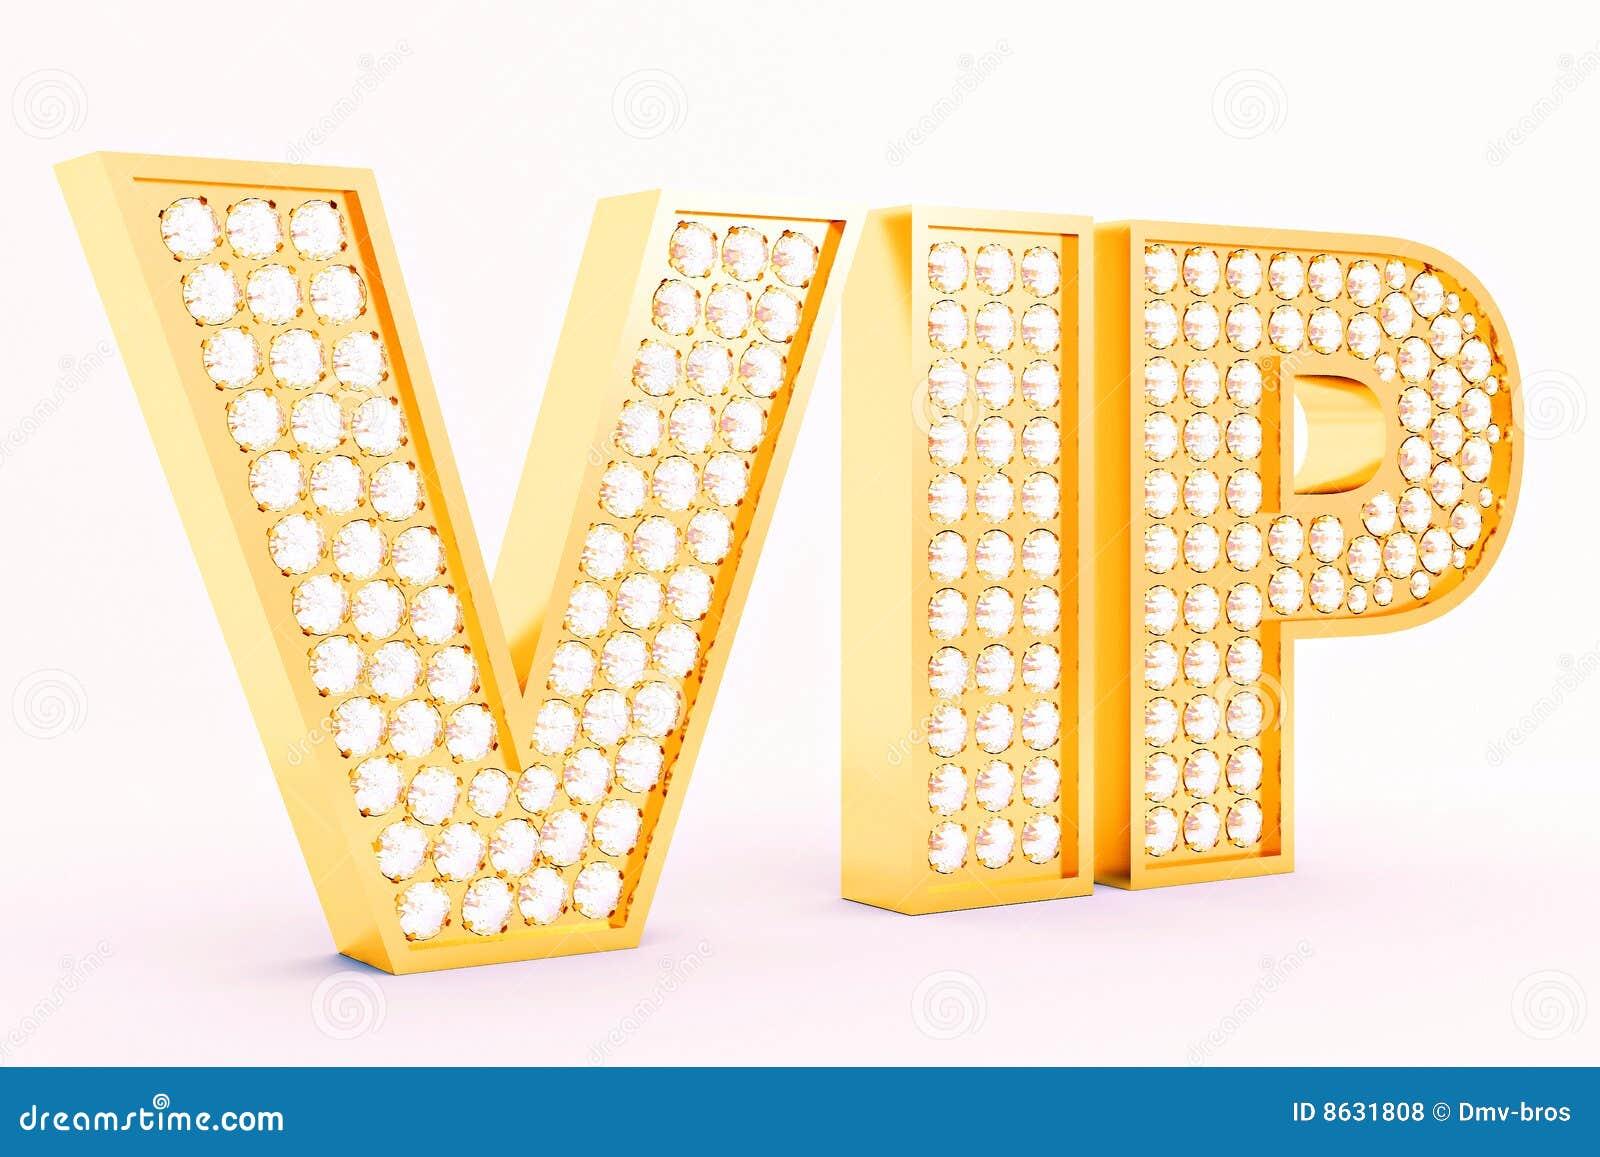 Vip Royalty Free Stock Photos Image 8631808